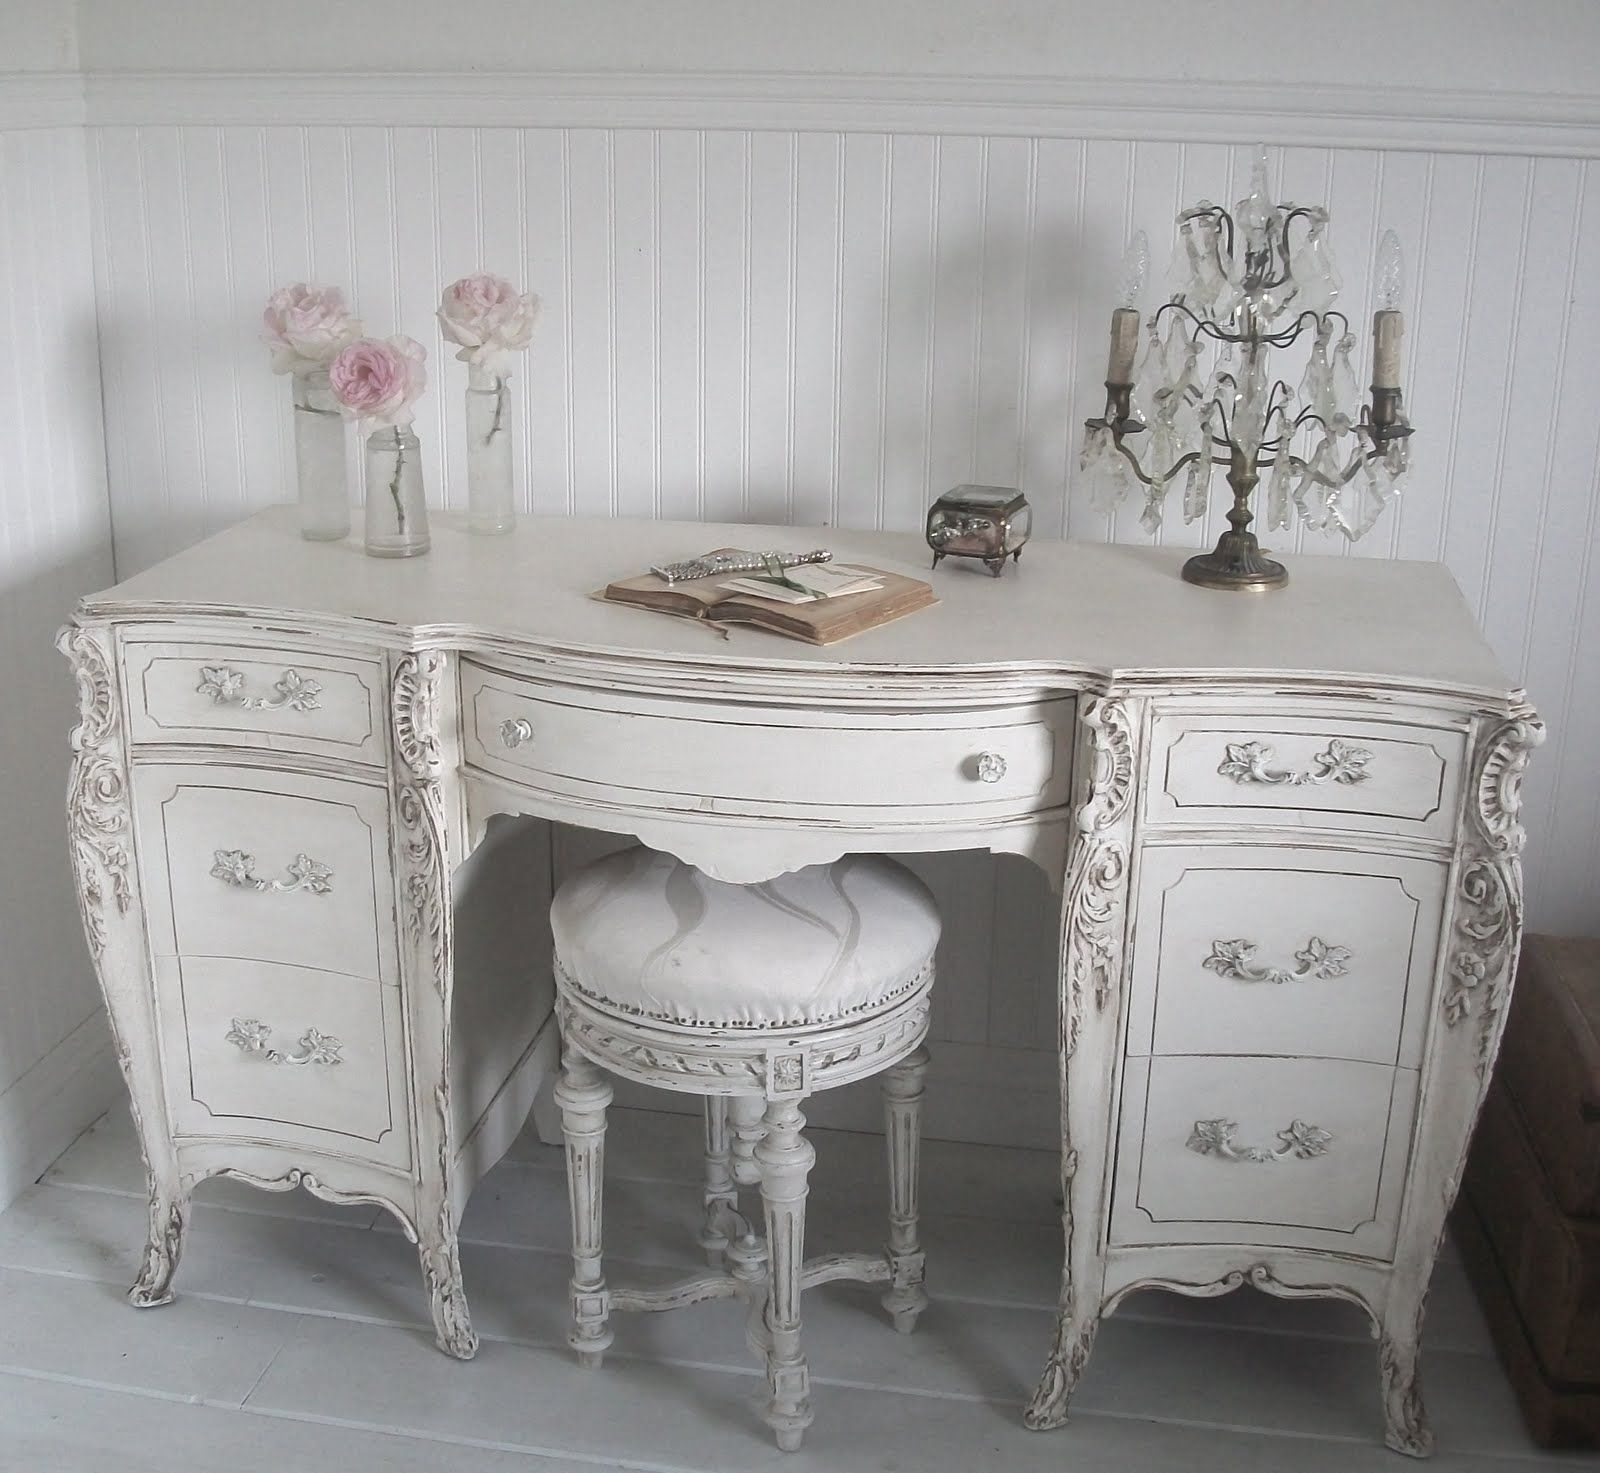 full bloom cottage french furniture einrichtung pinterest einrichtung. Black Bedroom Furniture Sets. Home Design Ideas